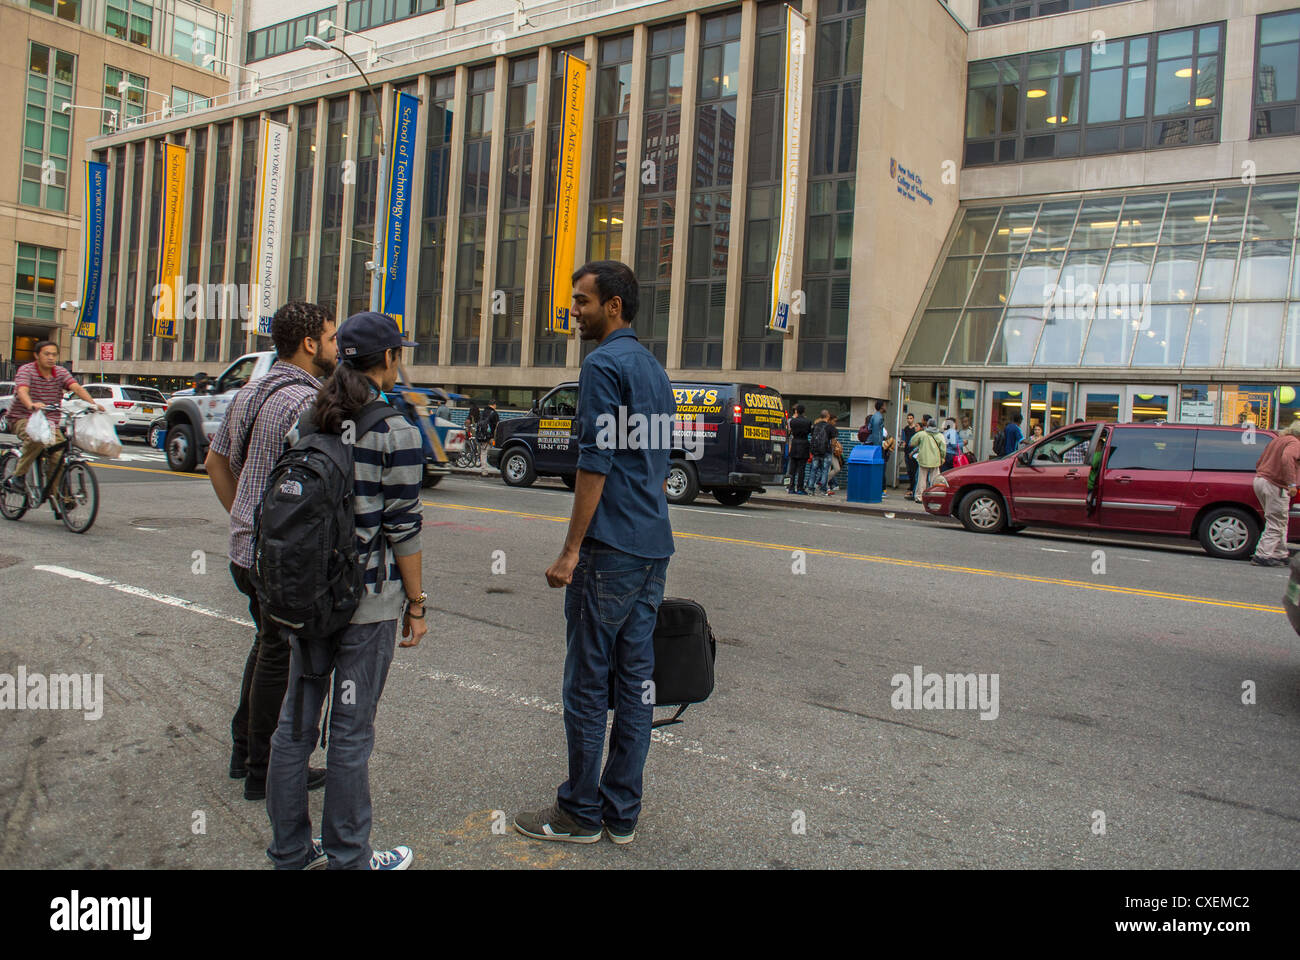 New York City, NY, USA, Street Scenes, Students talking outside Technical University, CUNY, Brooklyn - Stock Image